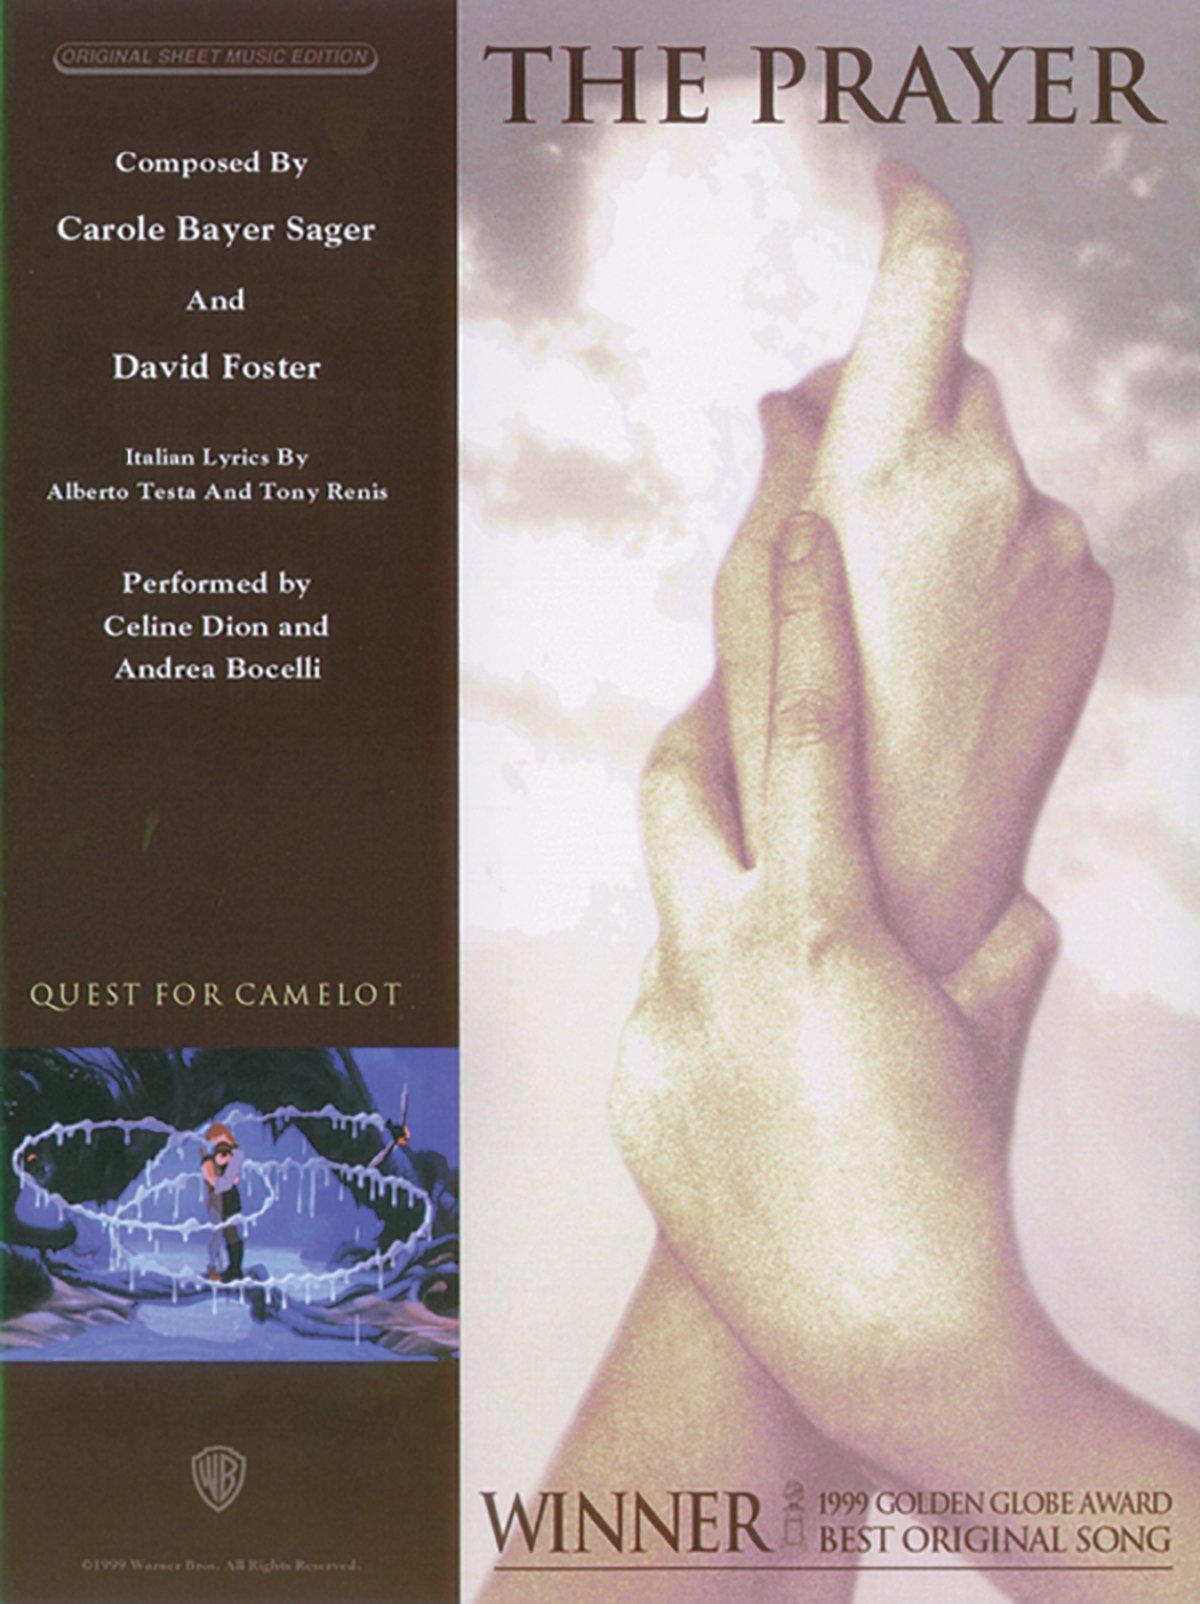 The Prayer Pianovocalchords Sheet Original Sheet Music Edition